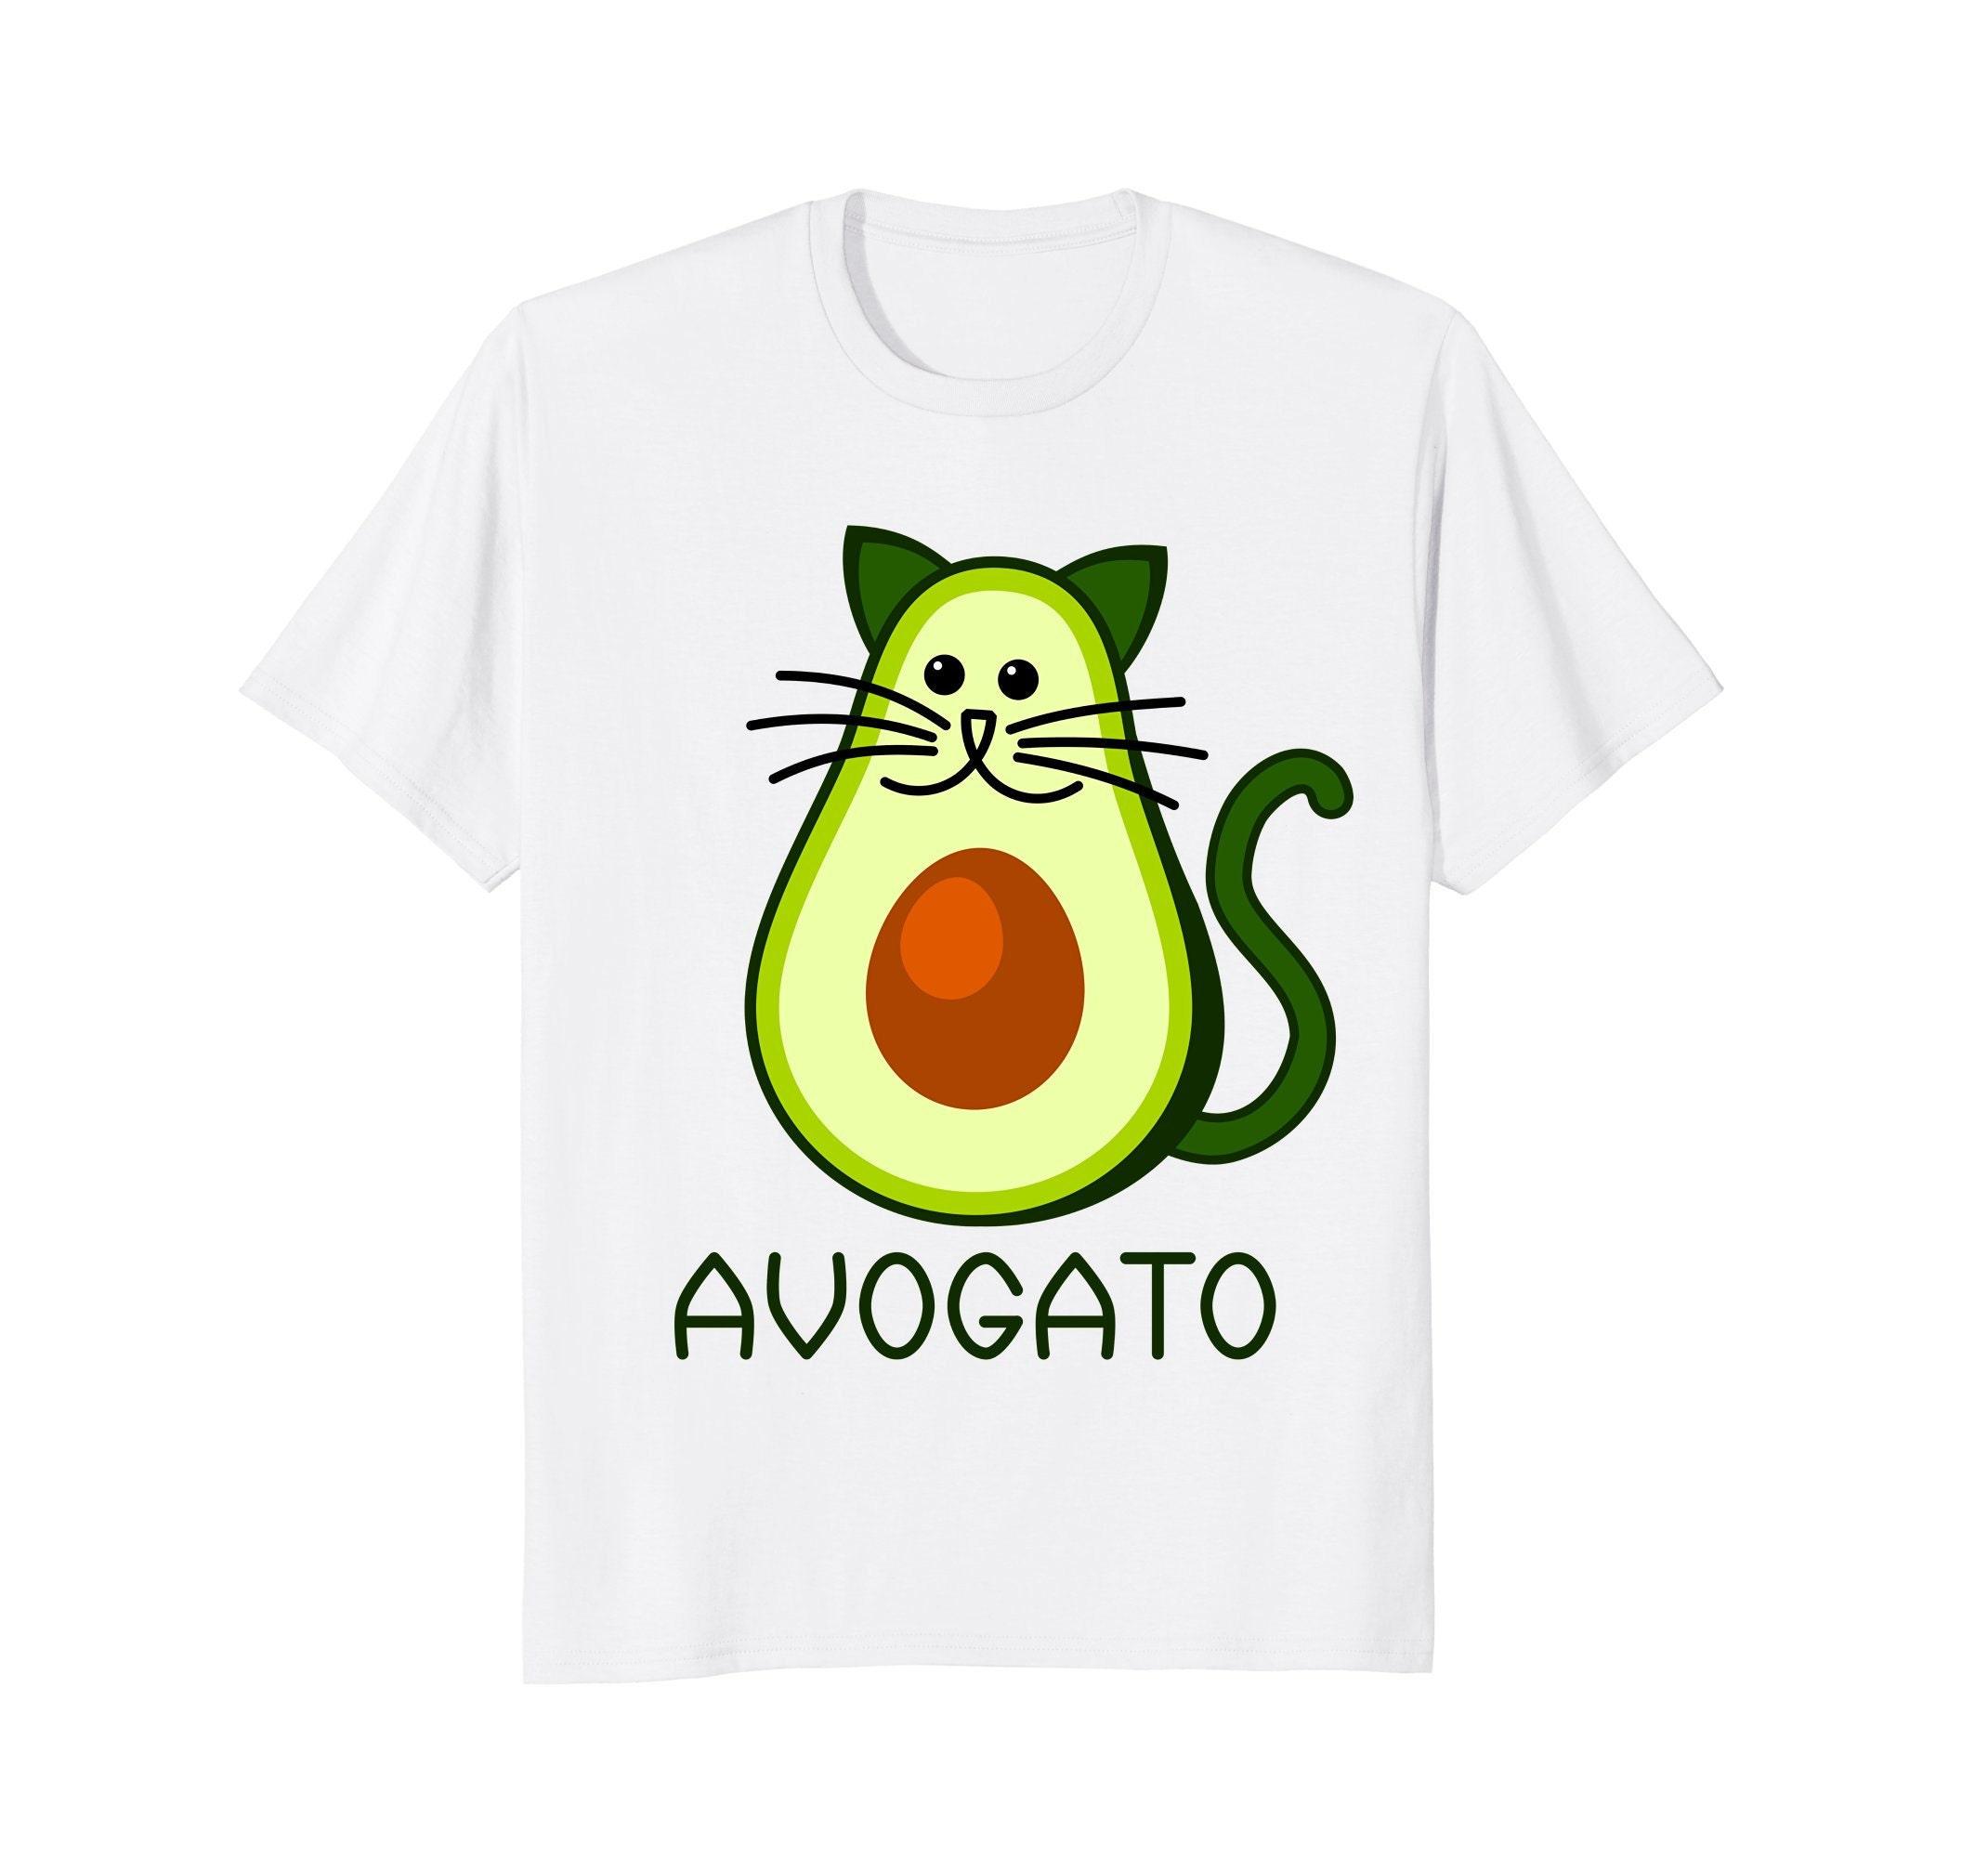 Avogato shirt